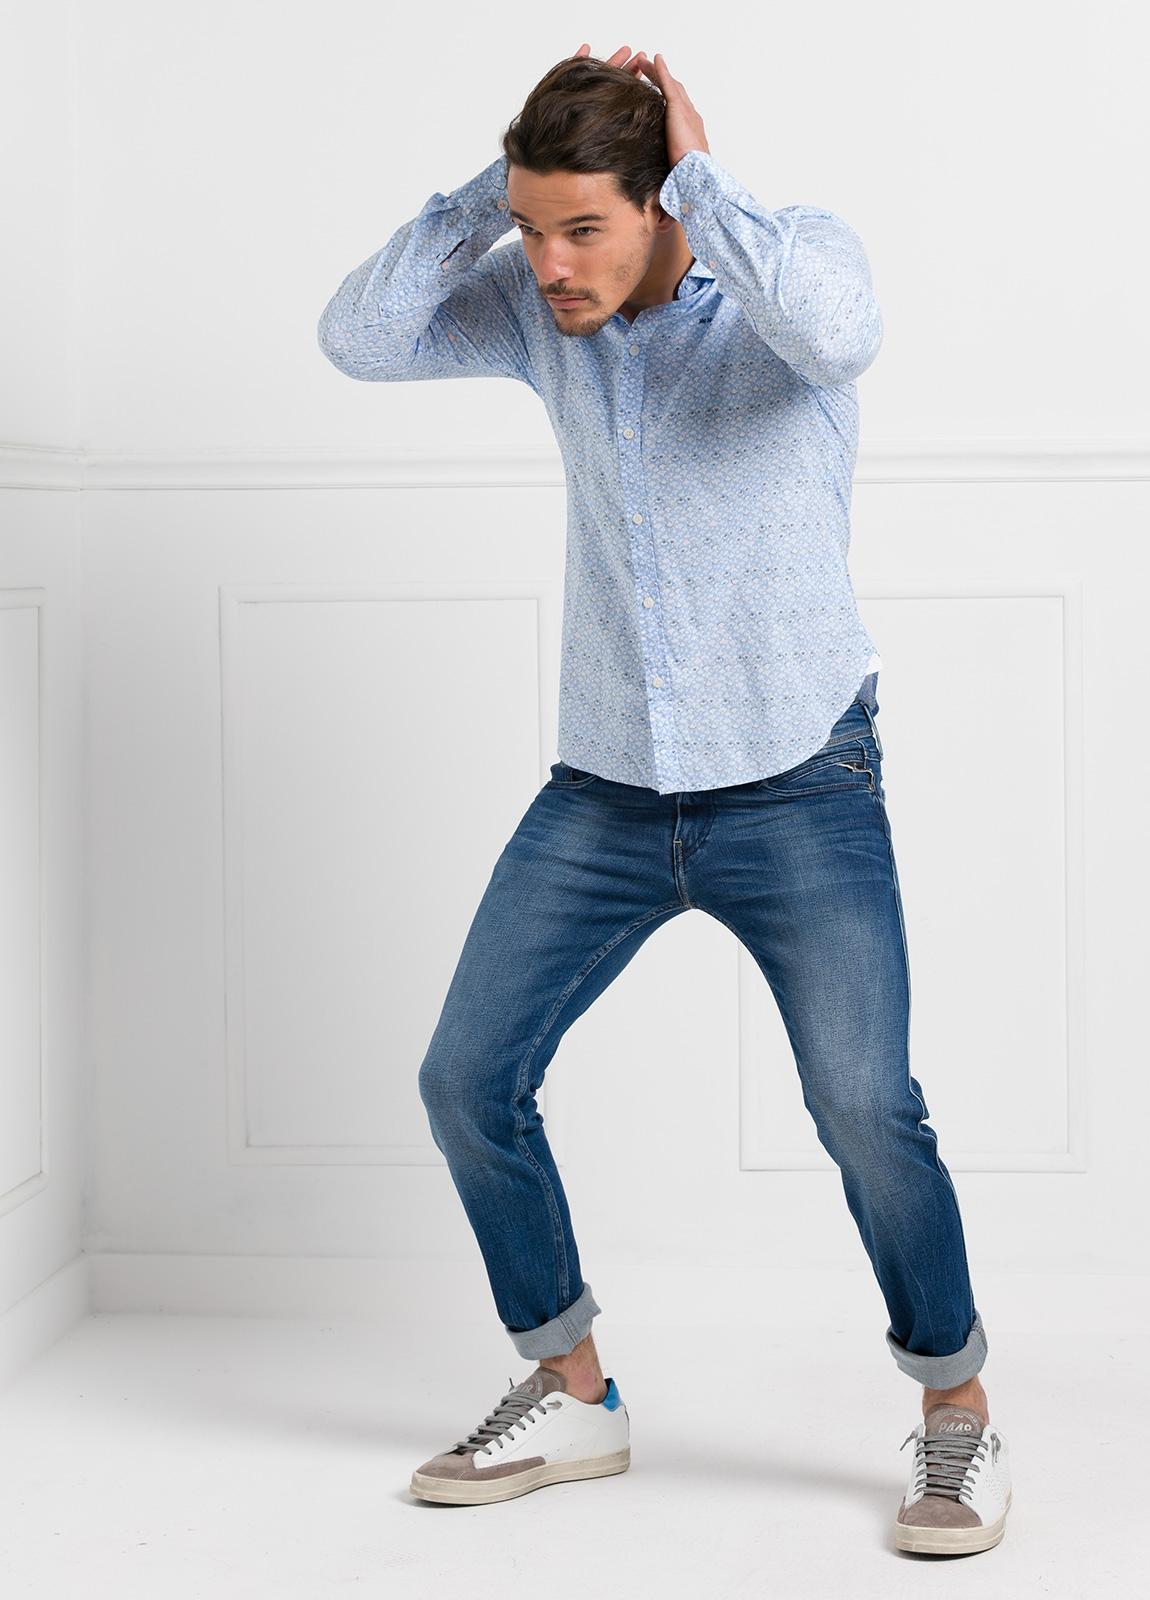 Camisa Sport dibujo color azul celeste, 100% Algodón. - Ítem1